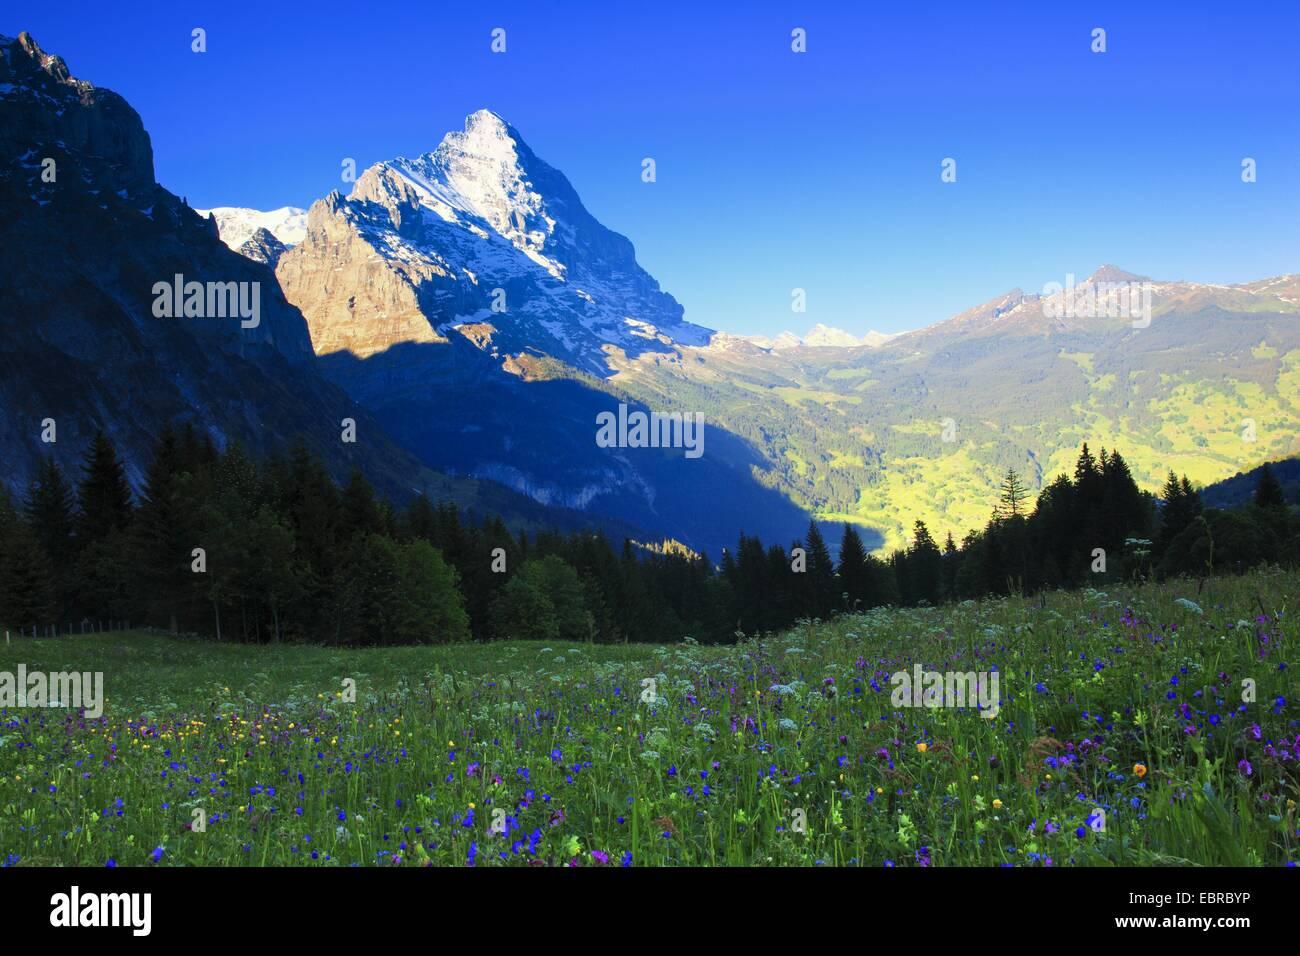 the sunlit Eiger under a clear blue sky, Switzerland, Berne, Grindelwald - Stock Image